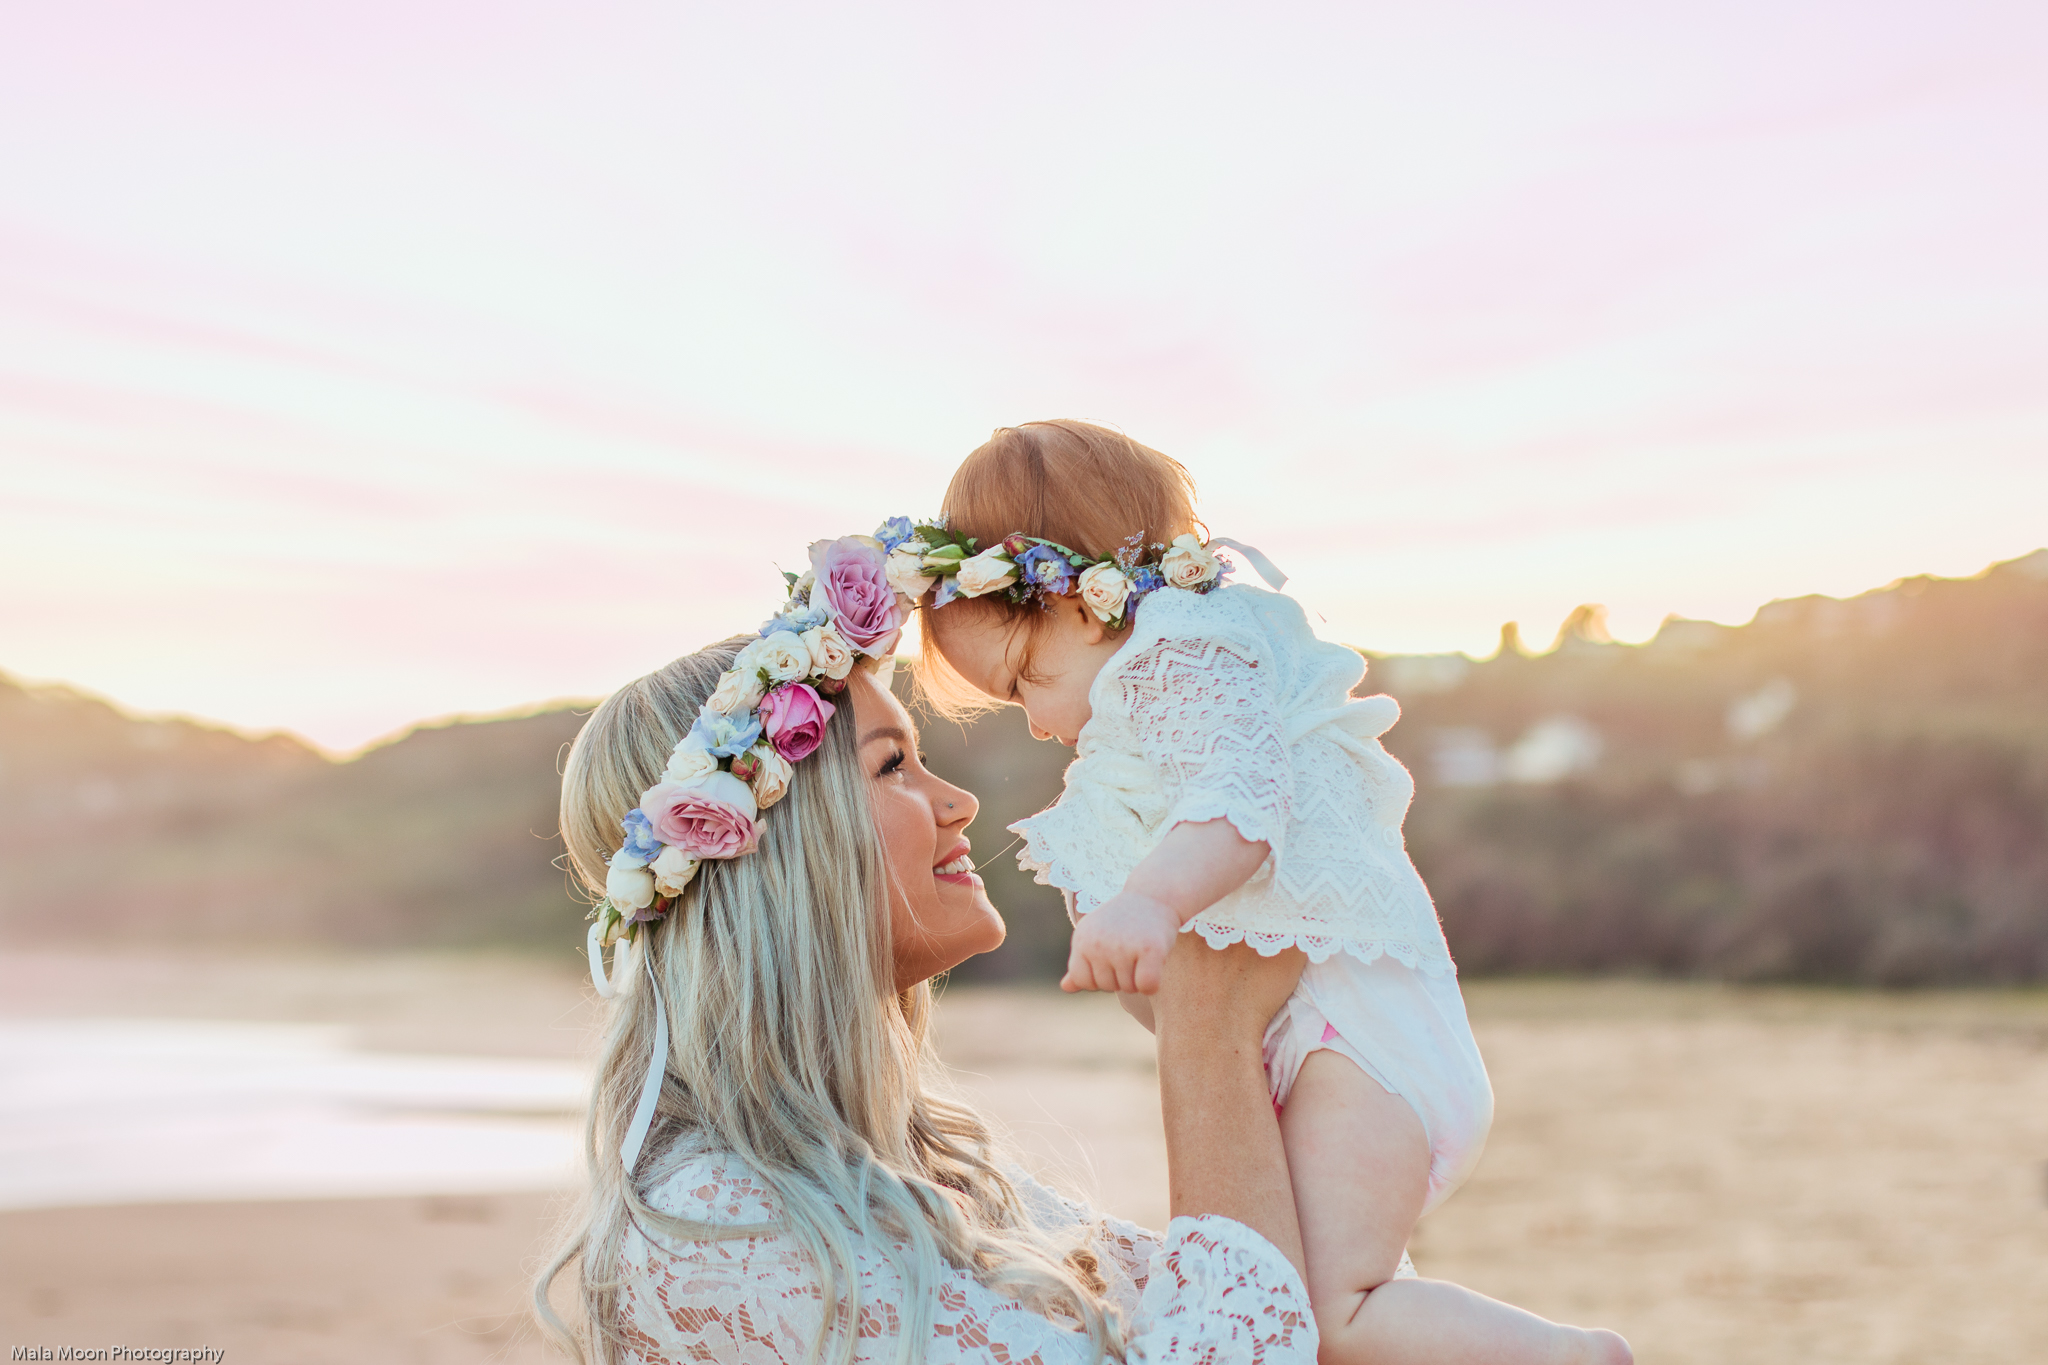 mum-holding-baby-above-her-head-at-beach